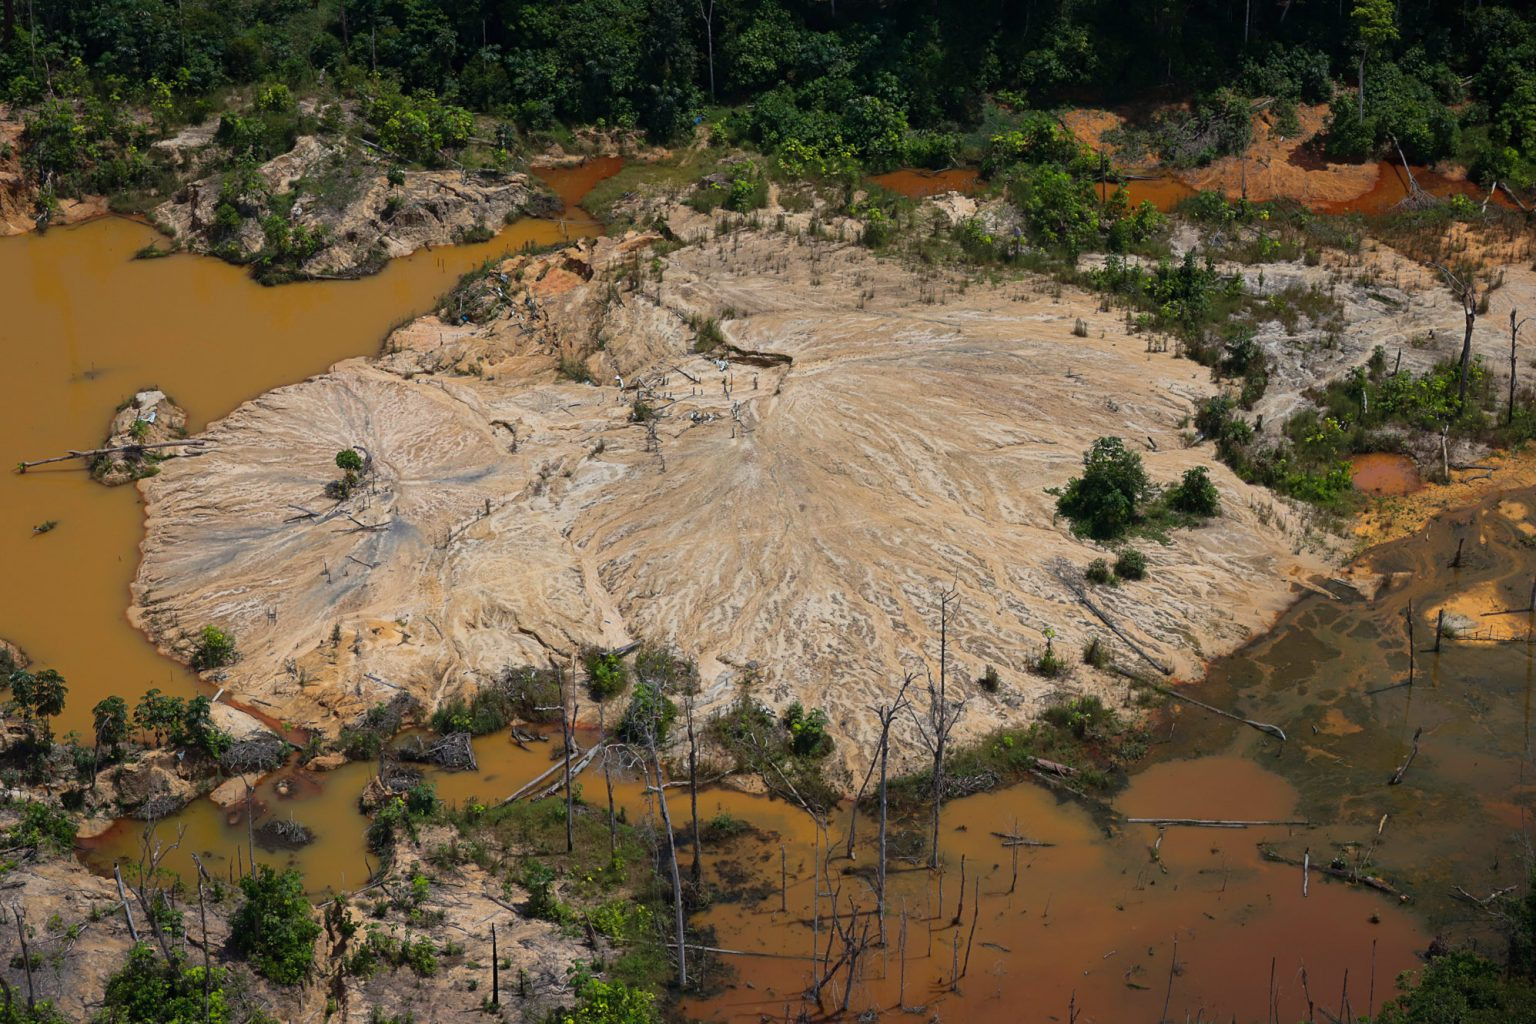 Garimpo ilegal na Terra Yanomami: aumento de 30% na atividade (Foto: Chico Batata / Greenpeace / Amazônia Real)